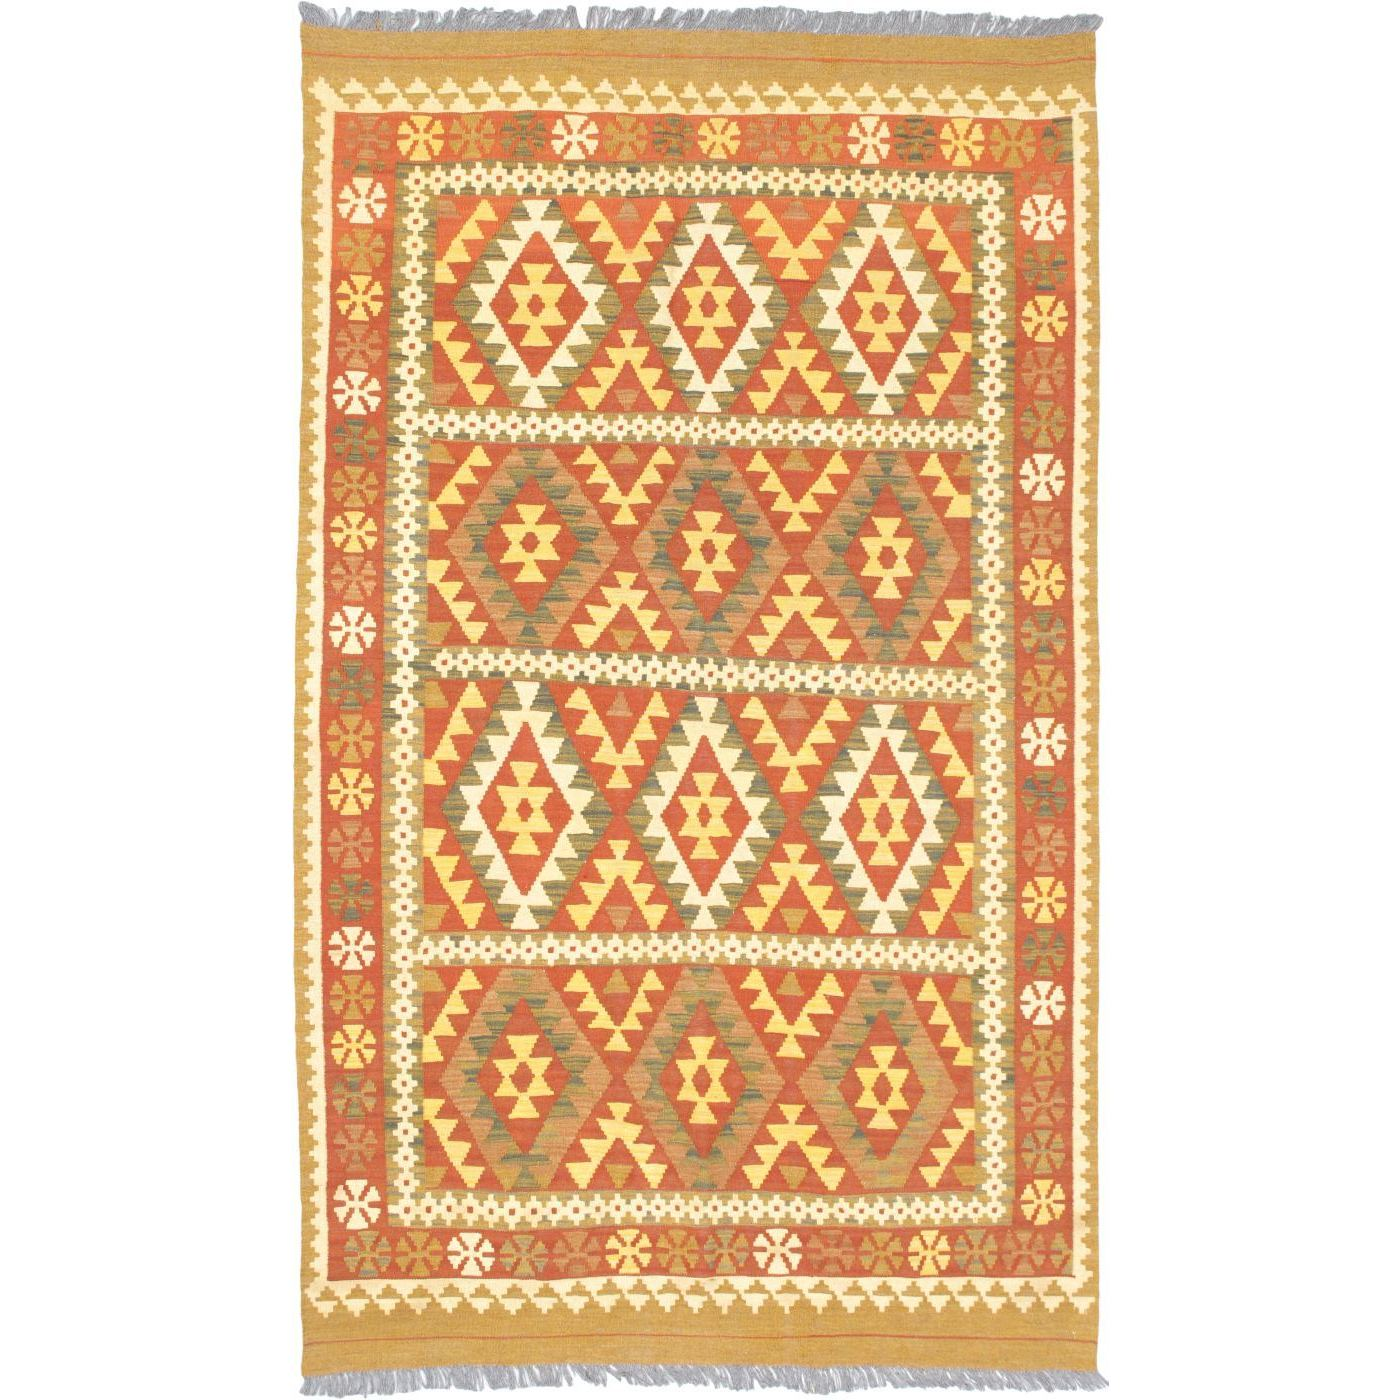 eCarpetGallery Flatweave Hereke Orange Wool Kilim (50 x 85) (Orange Kilim (5 x 8))